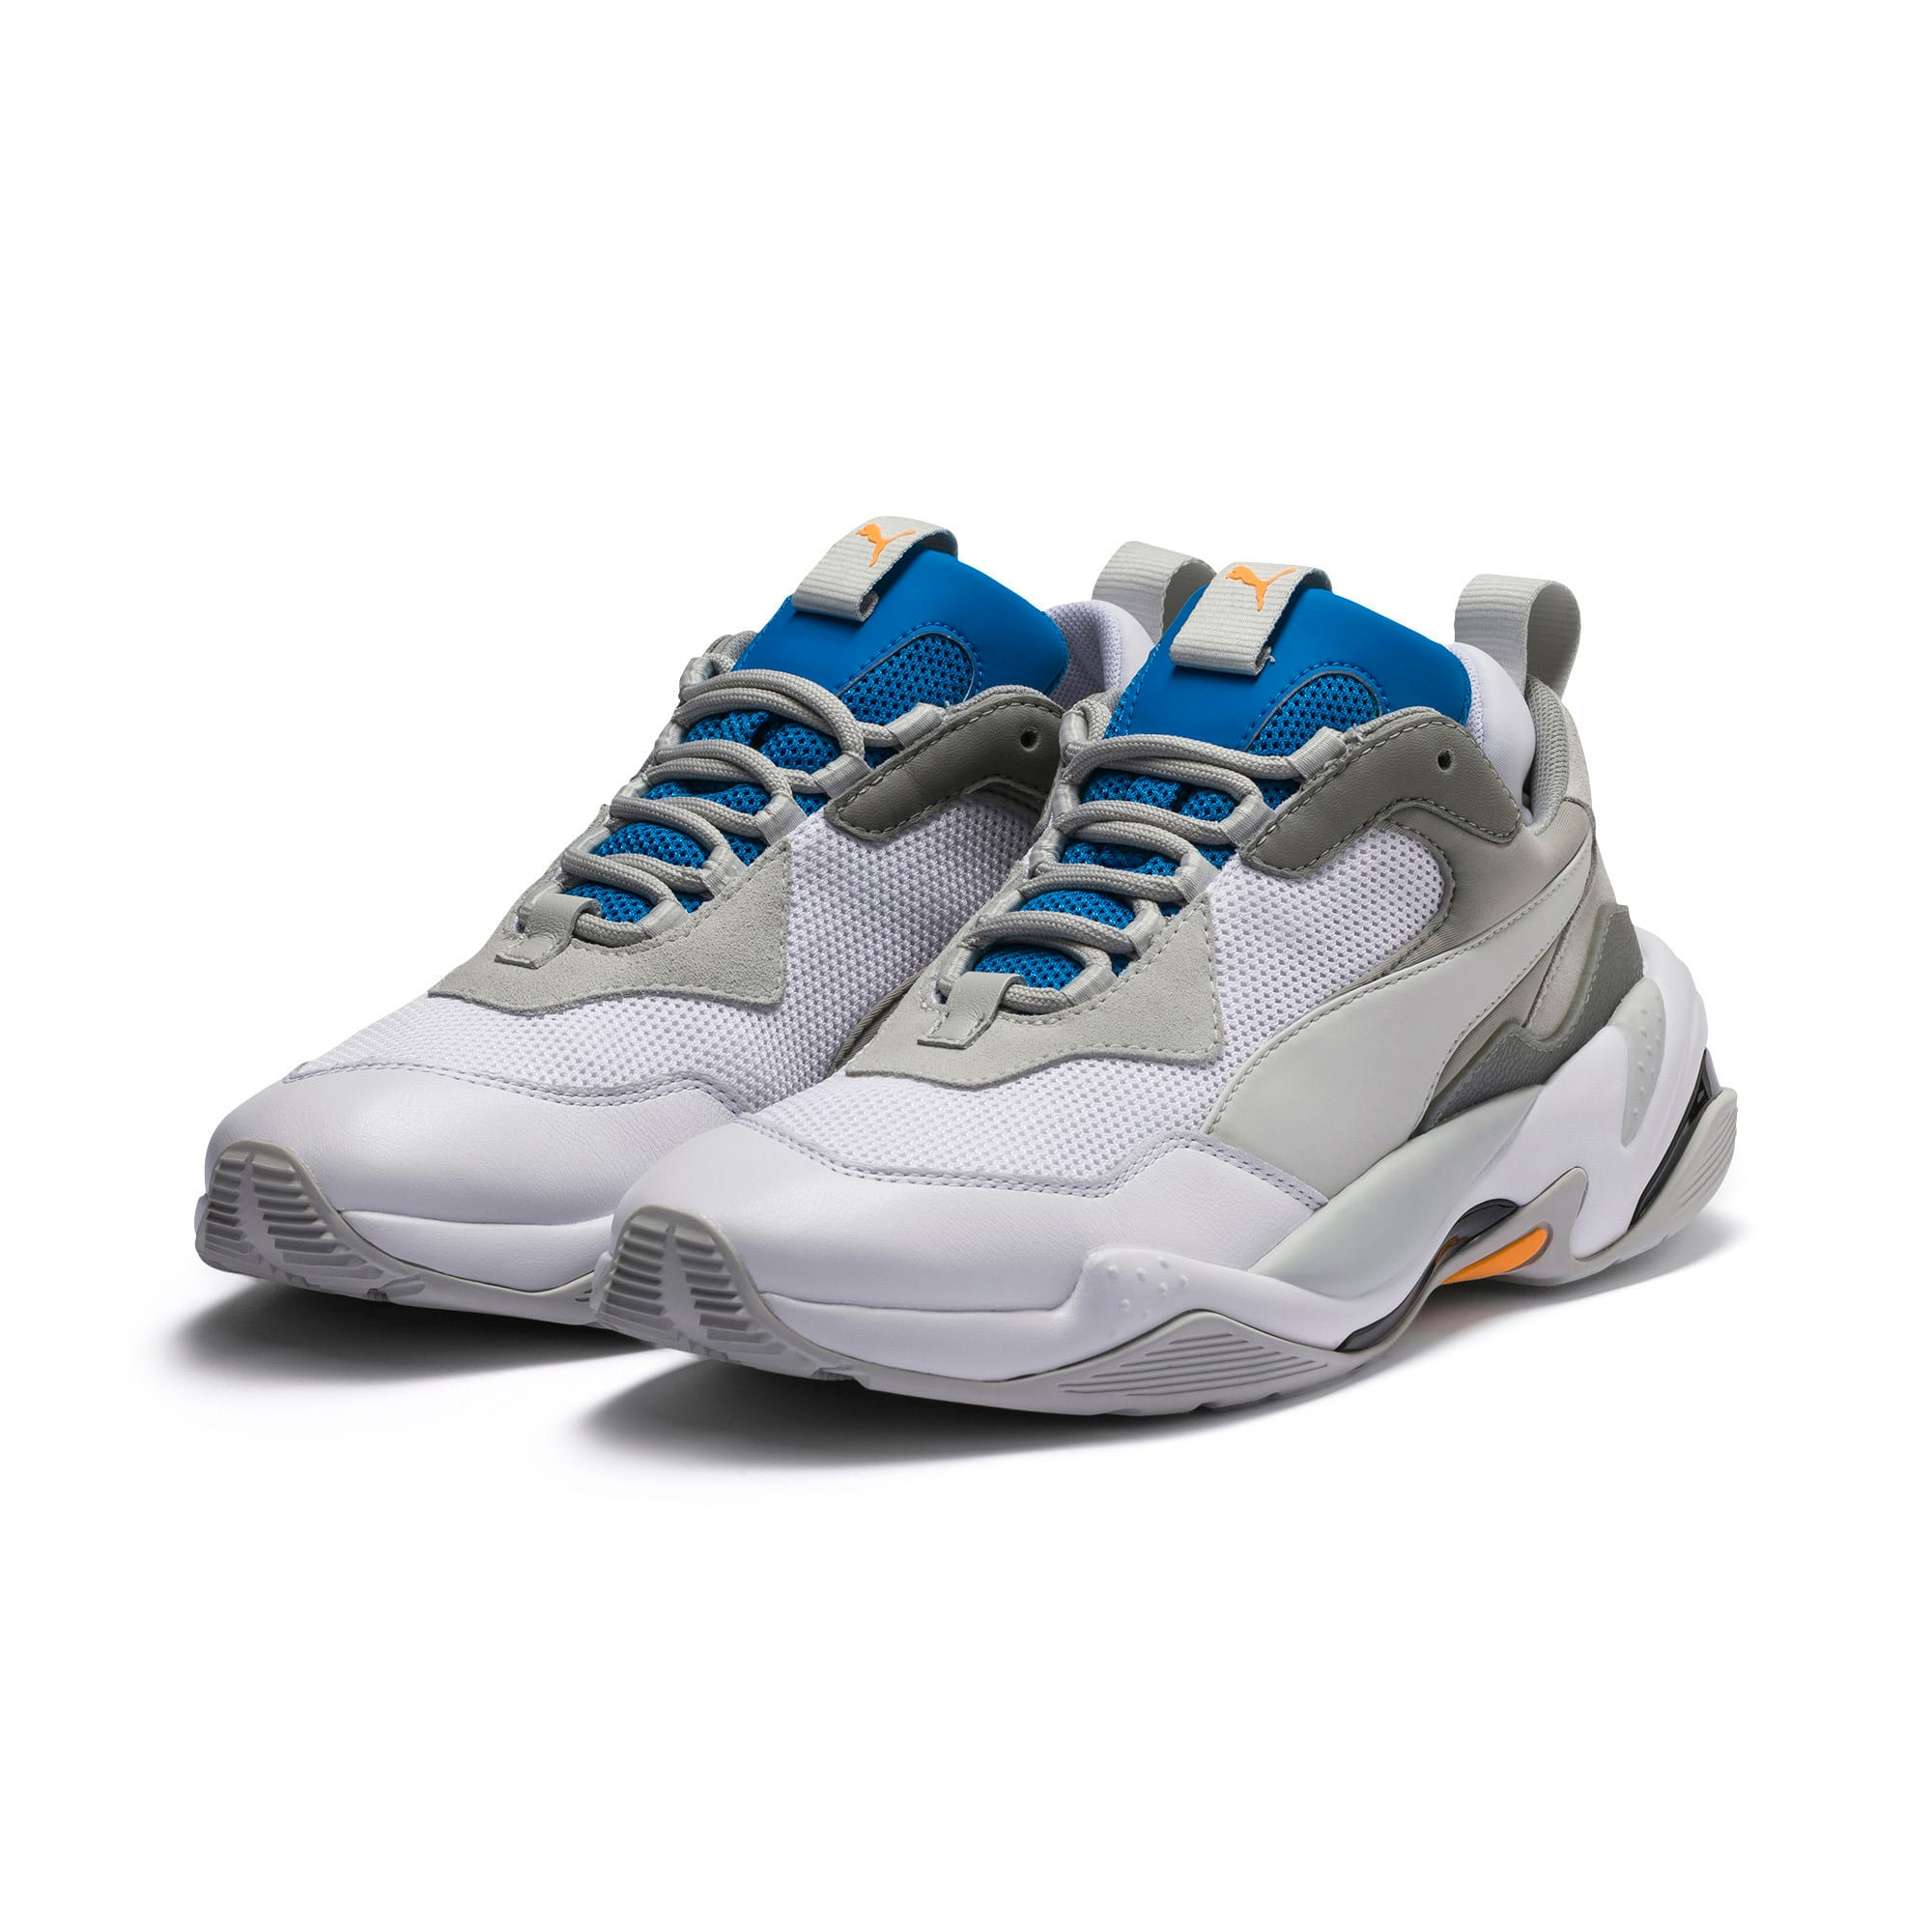 Thumbnail 2 of Thunder Spectra Sneakers, Glacier Gray-Indigo Bunting, medium